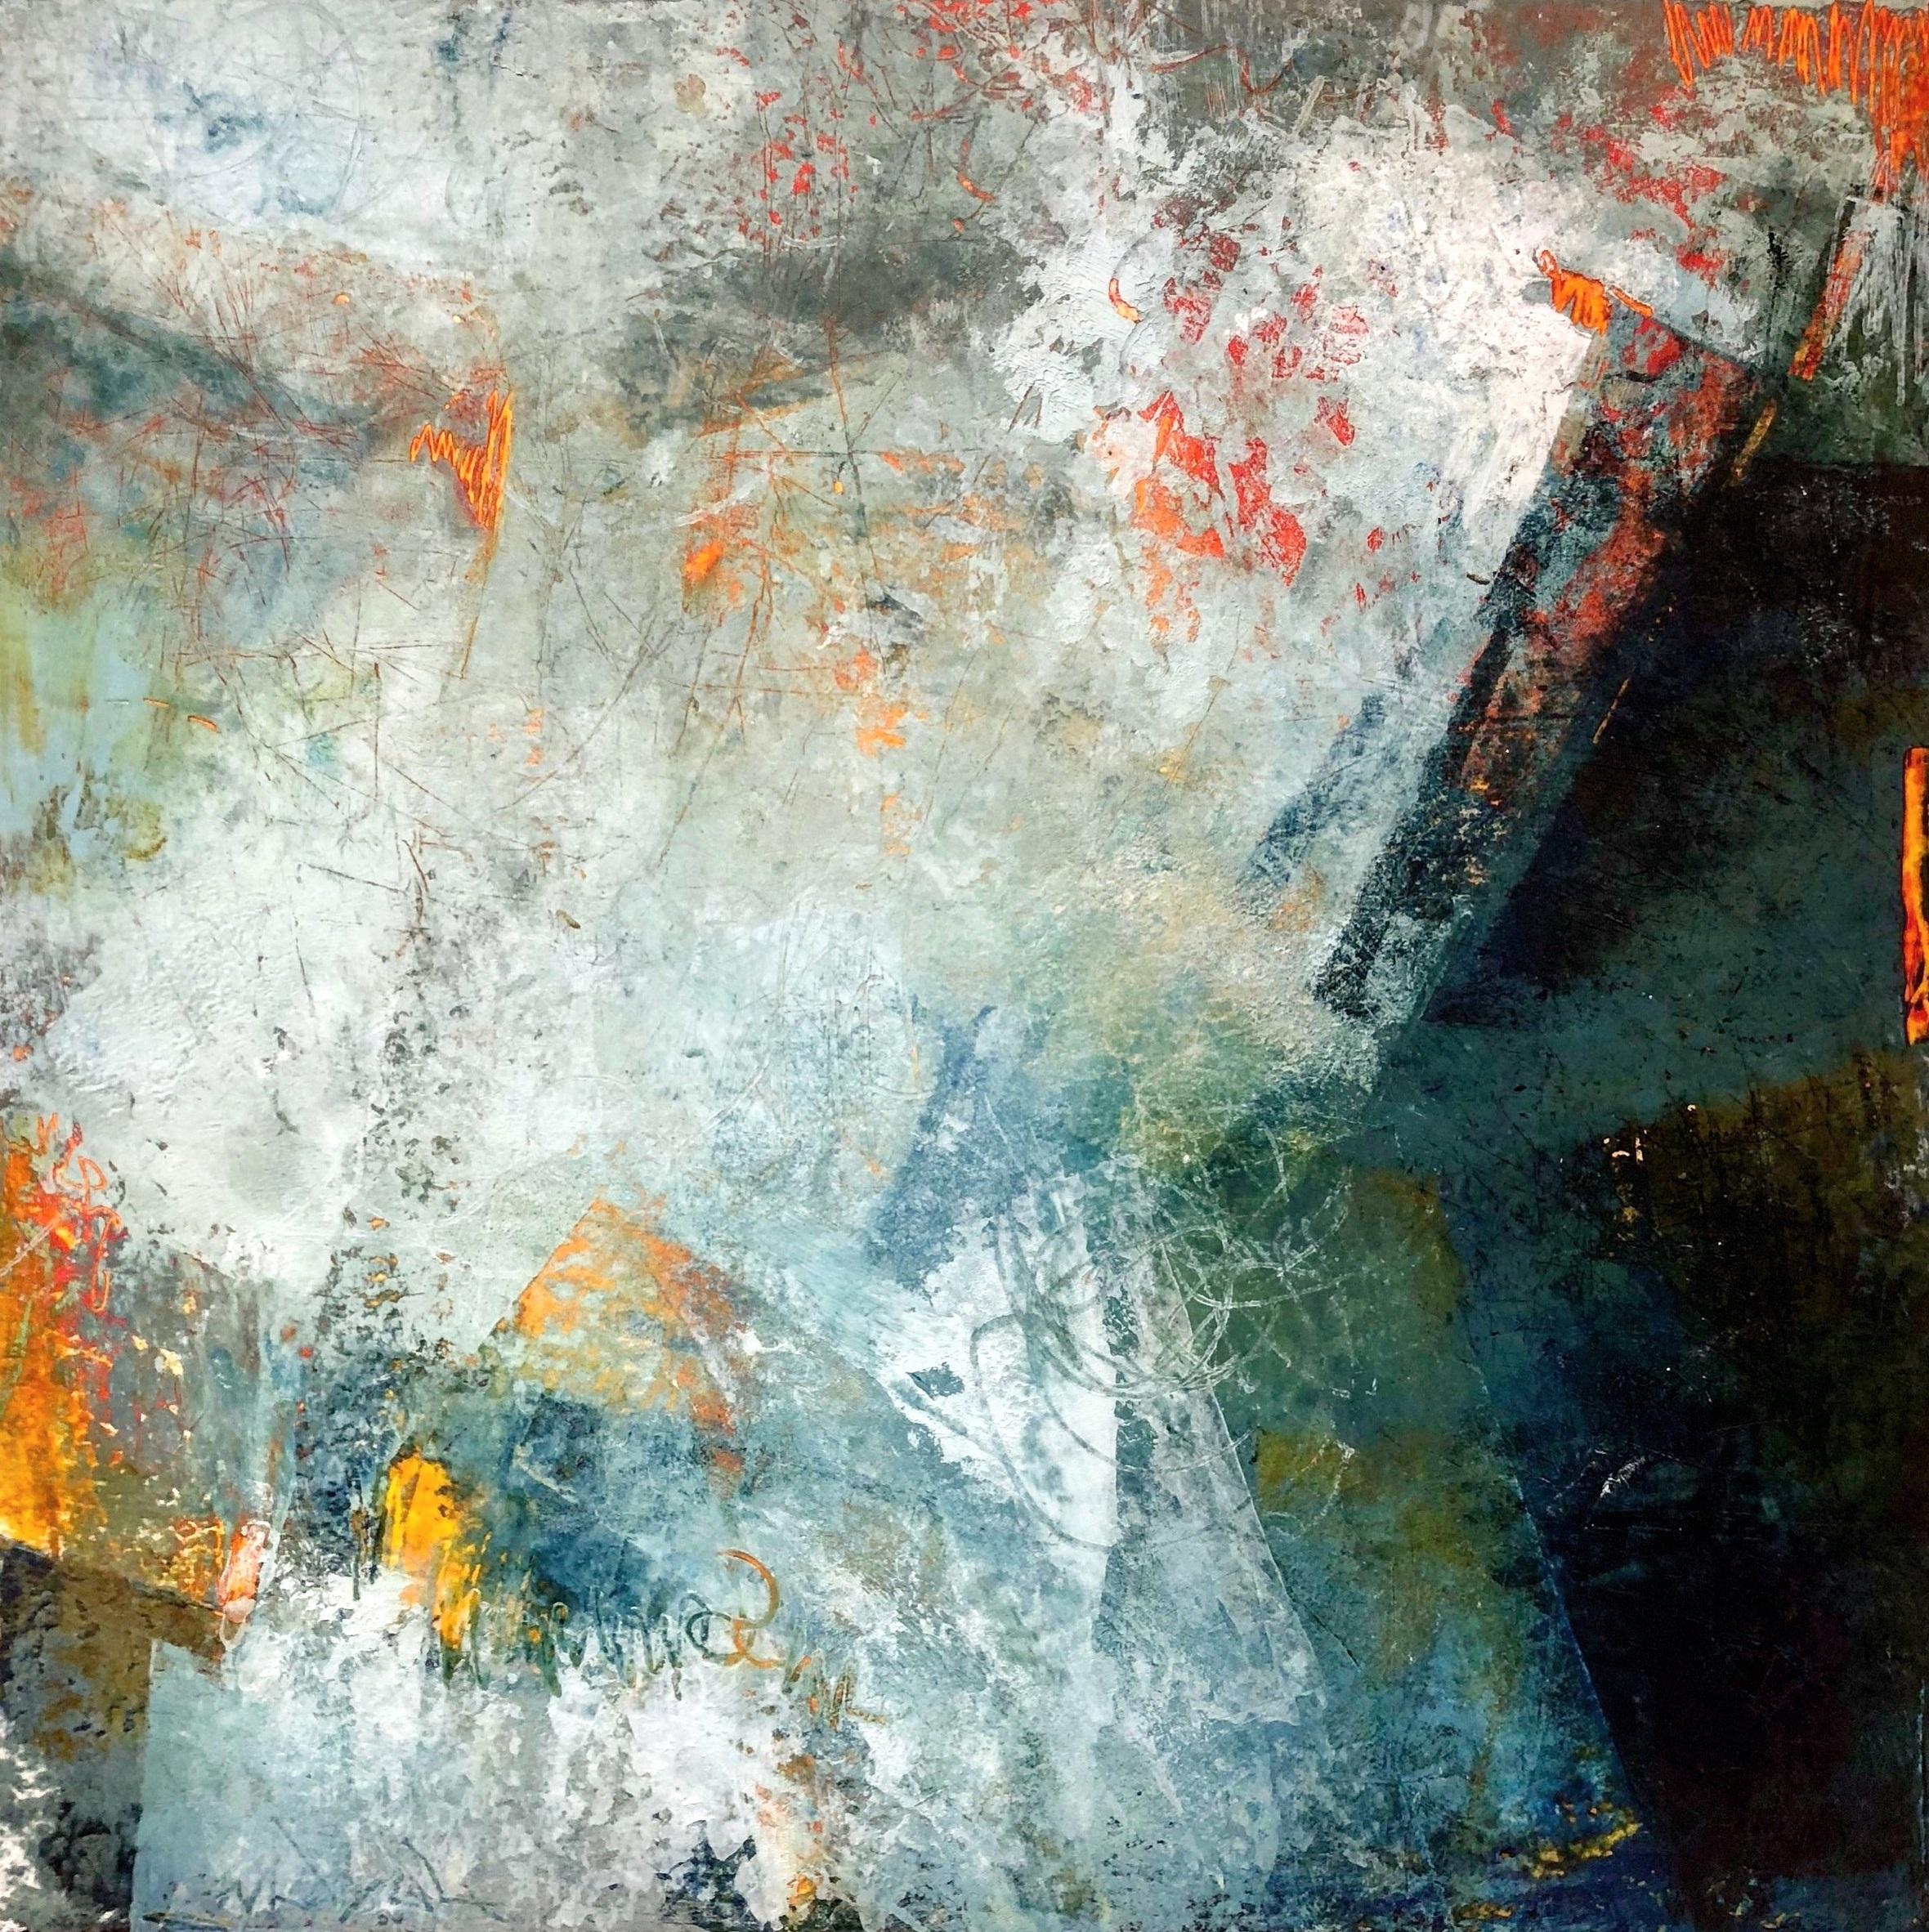 Illuminating the Fog (16x16) framed $375